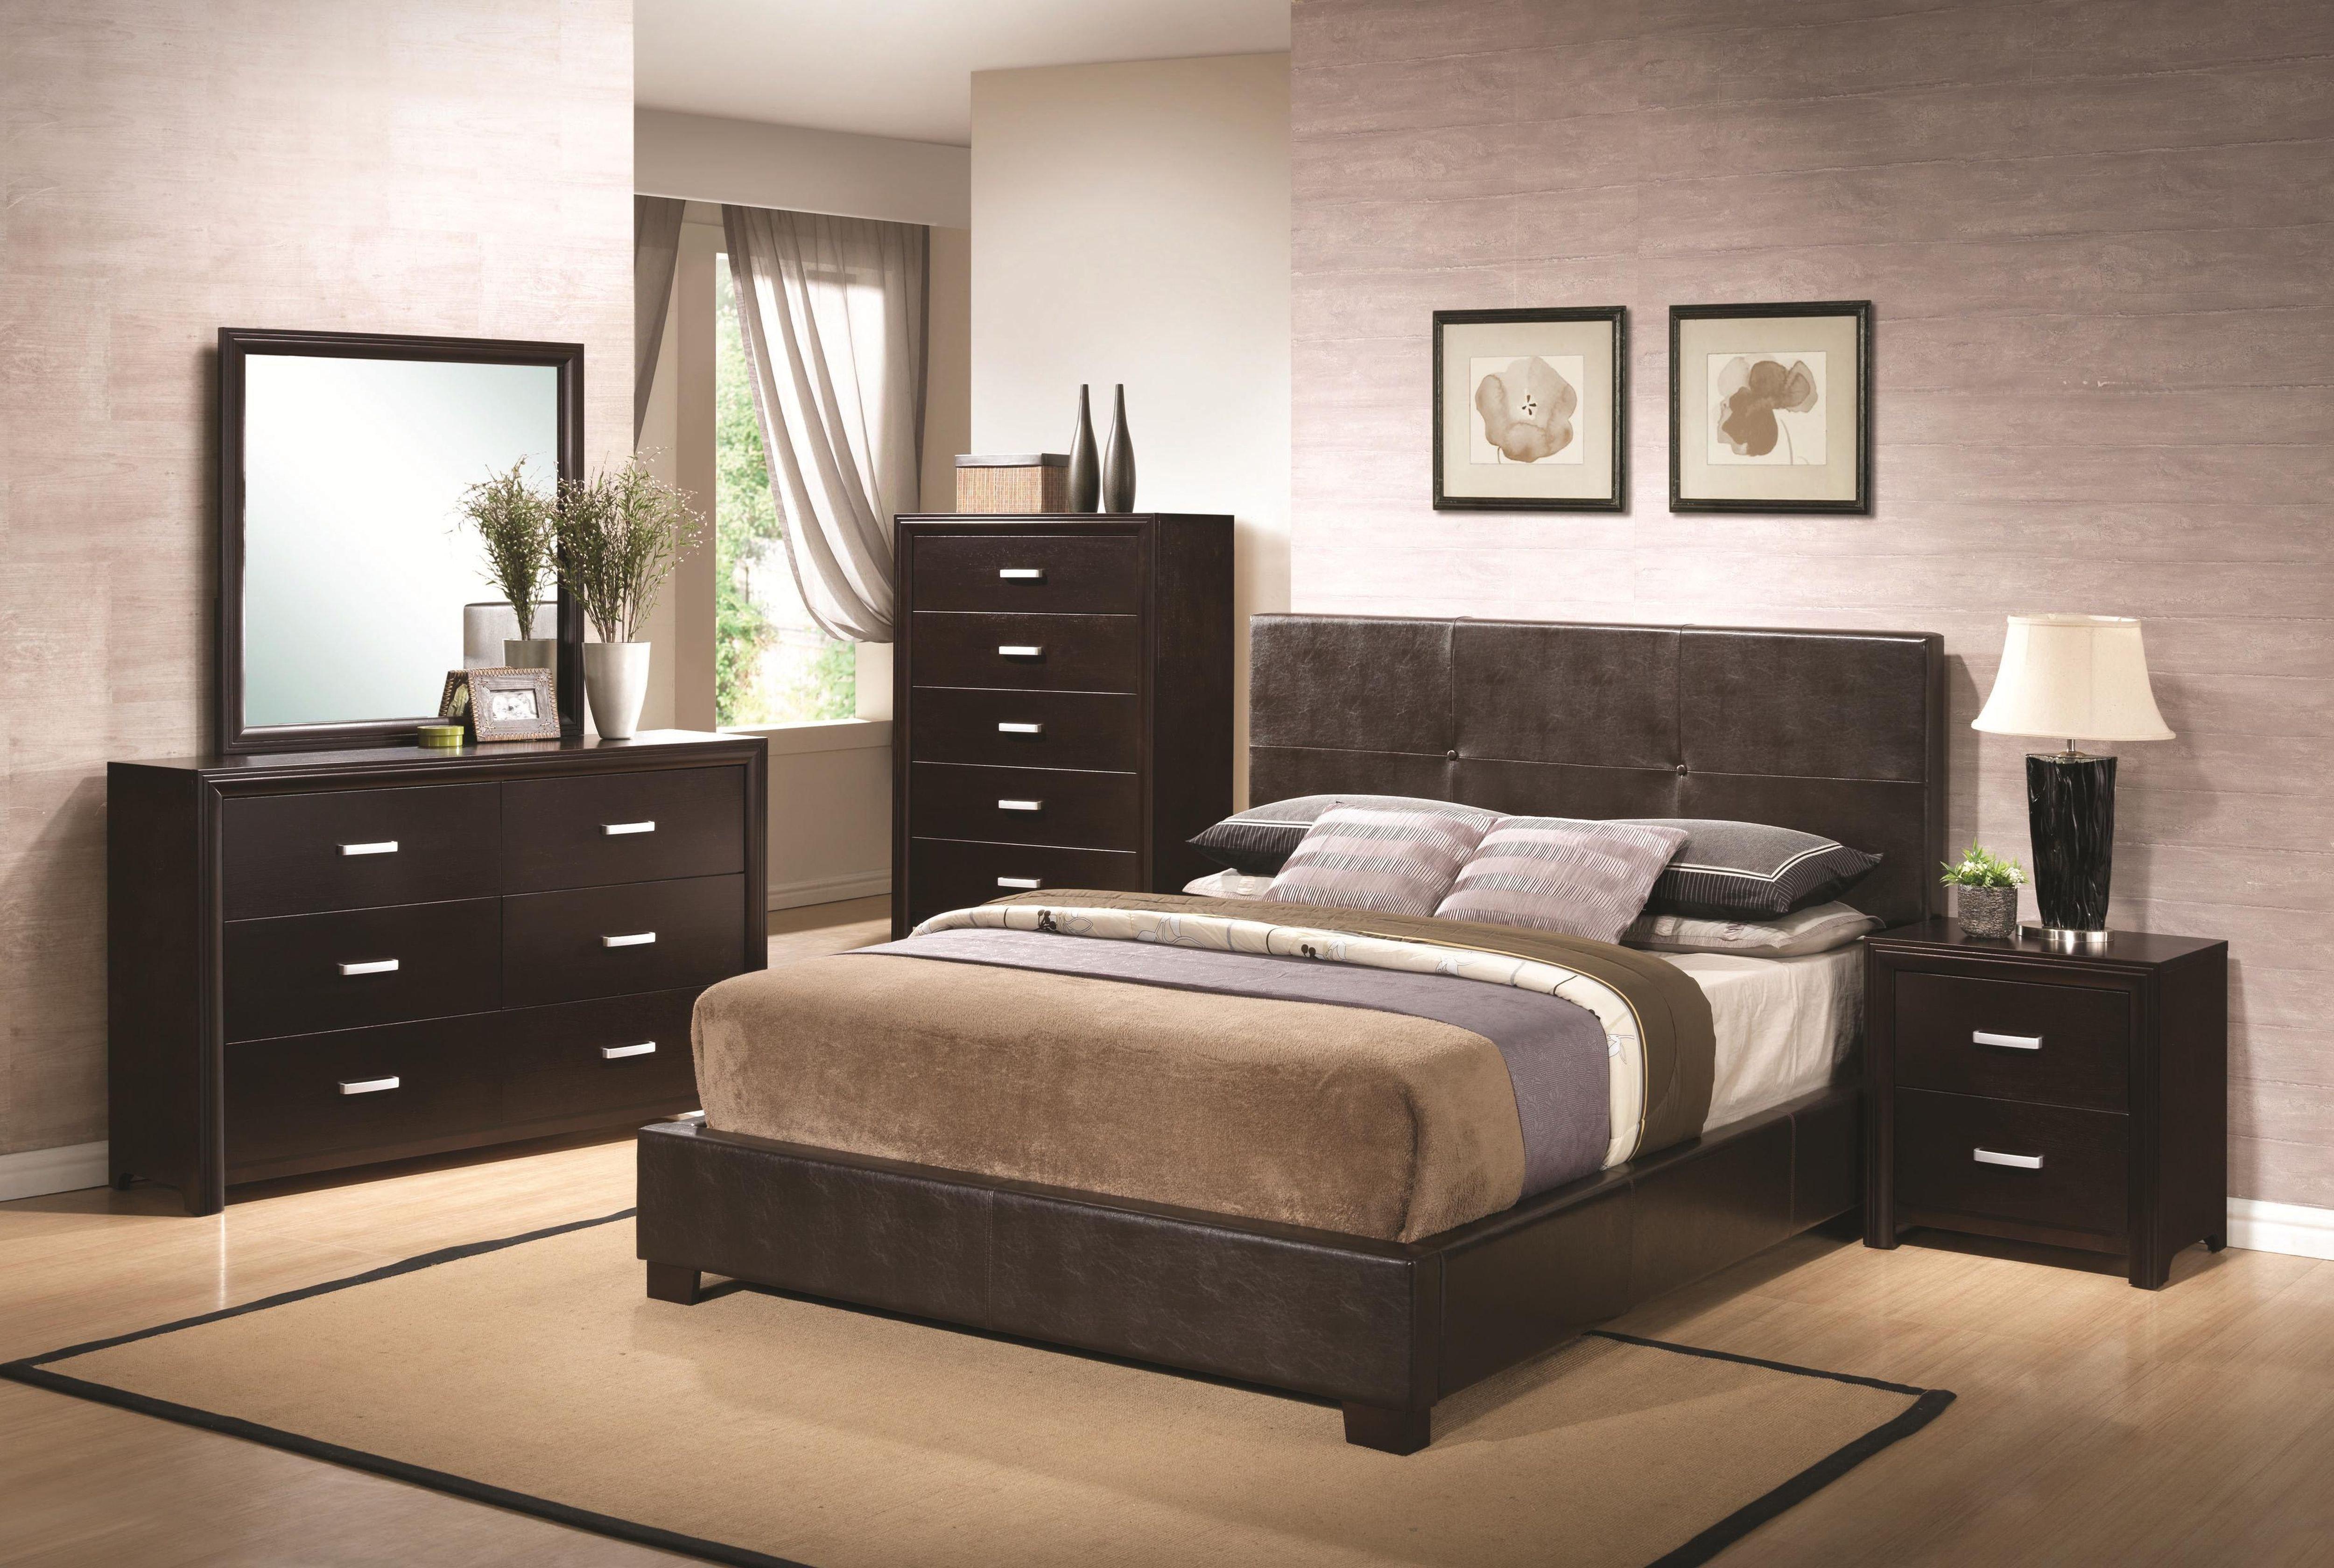 Twin Bedroom Set Ikea New Pin by northernstarlite On Bedroom